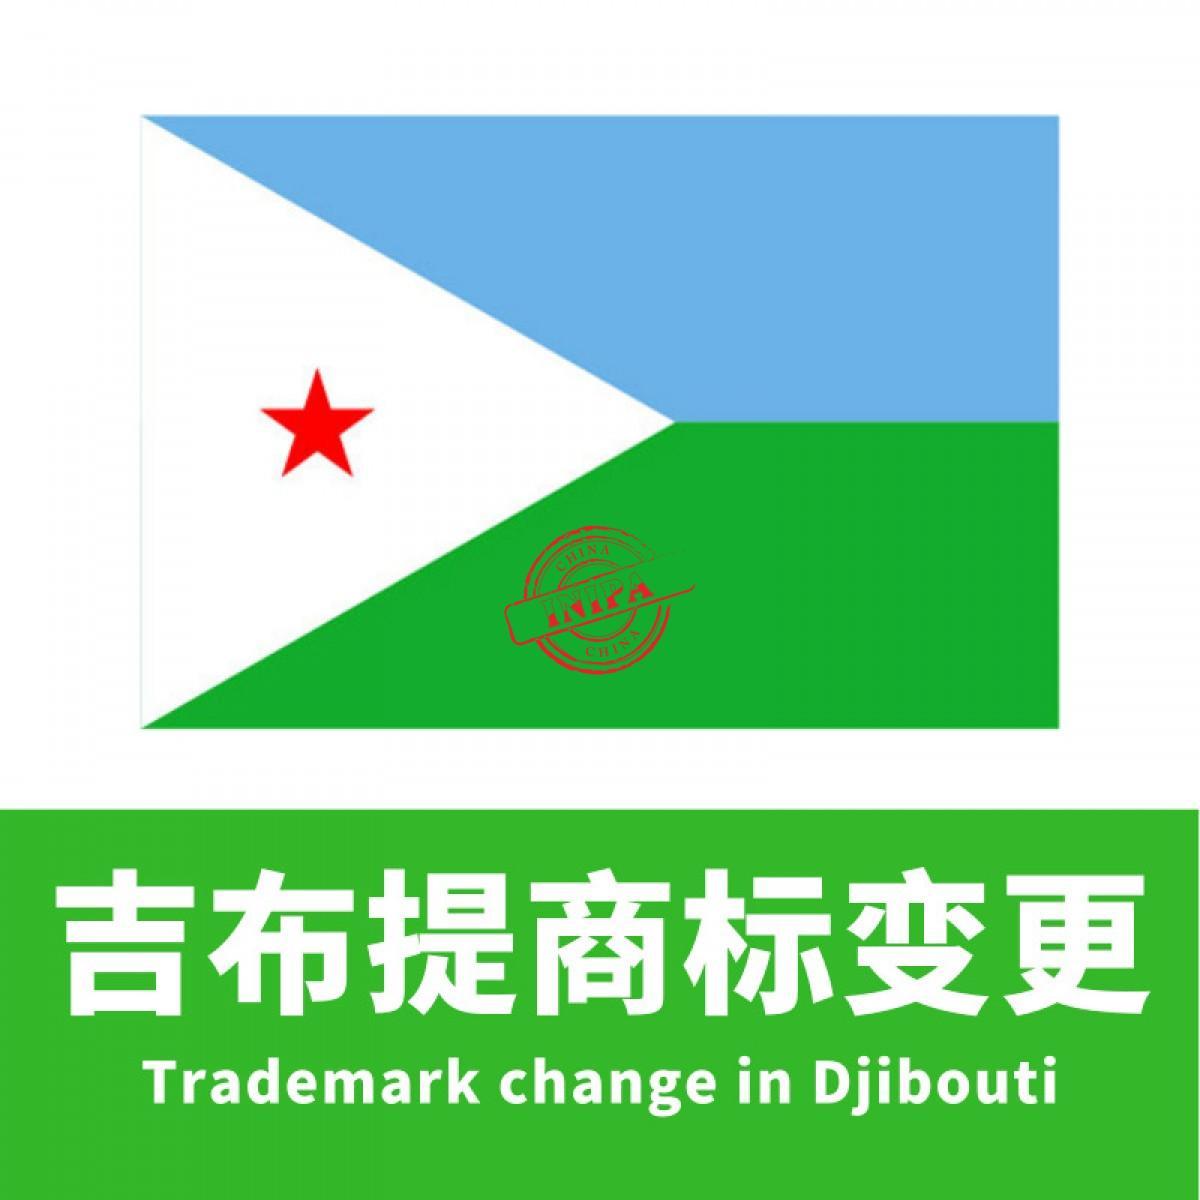 吉布提商标变更/Djibouti trademark changed